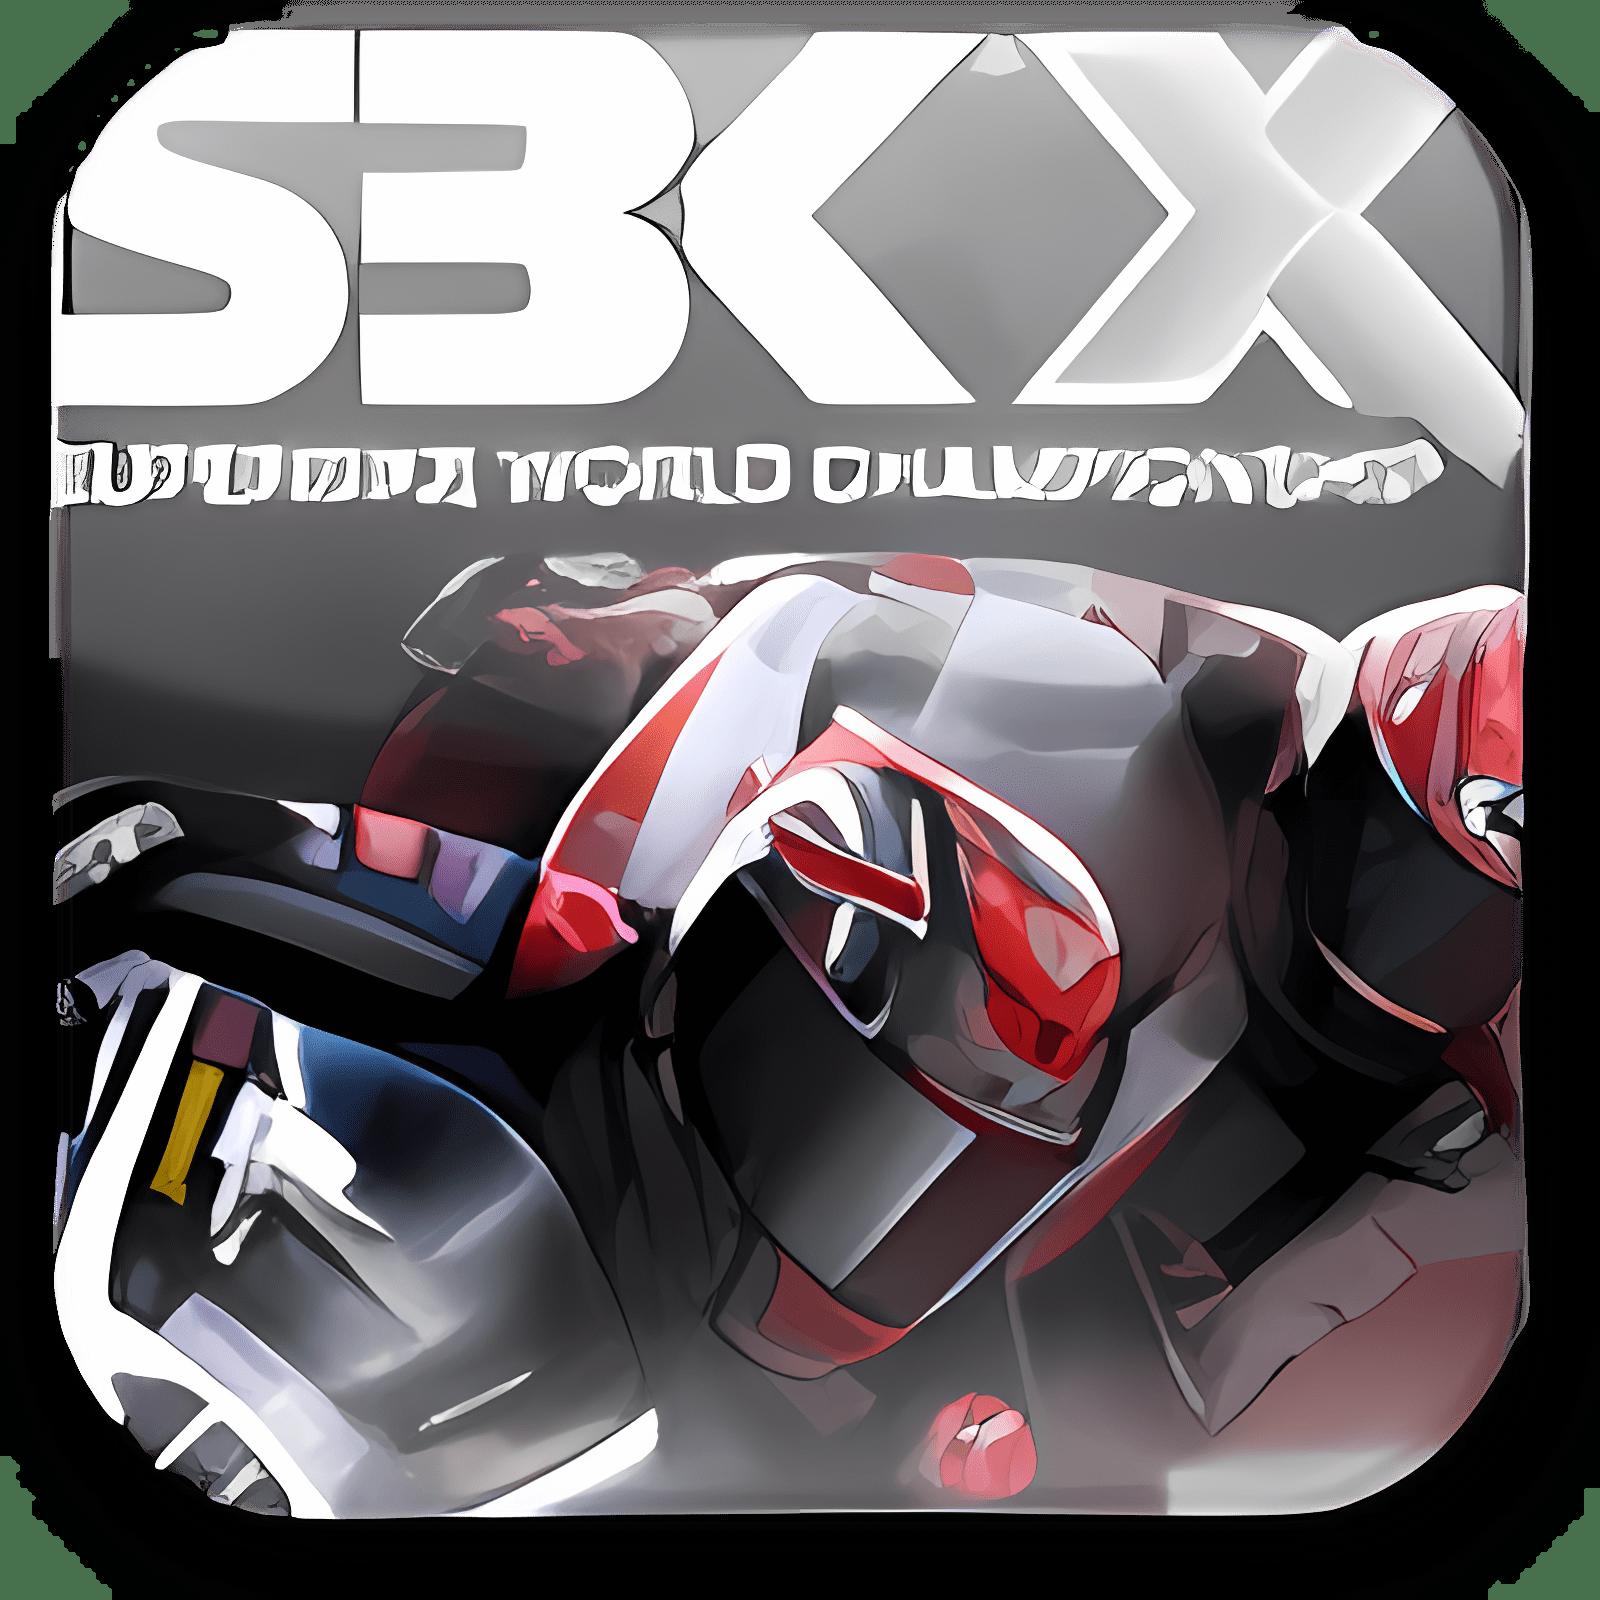 SBK-X